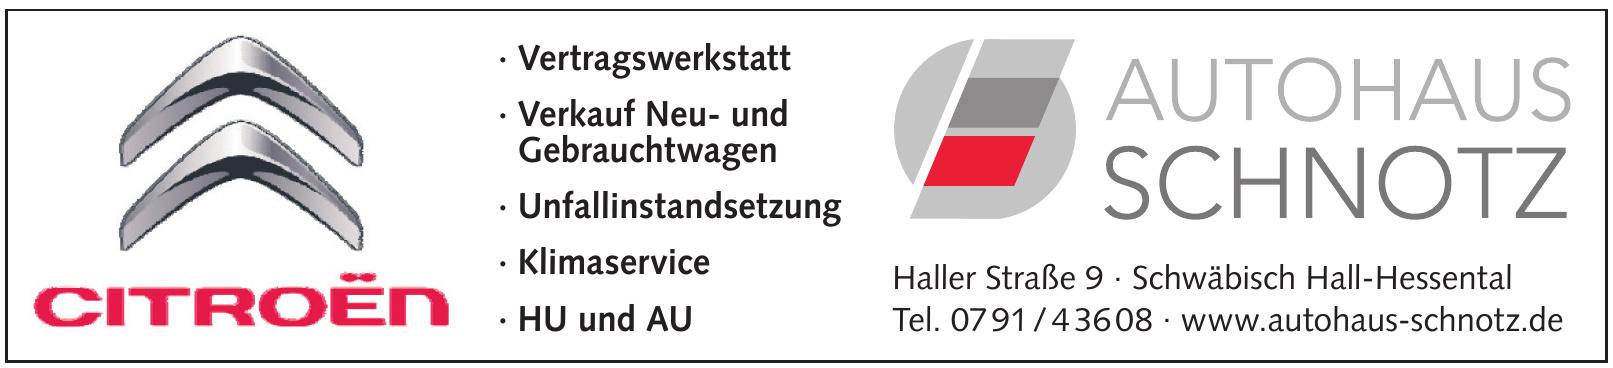 Autohaus Schnotz